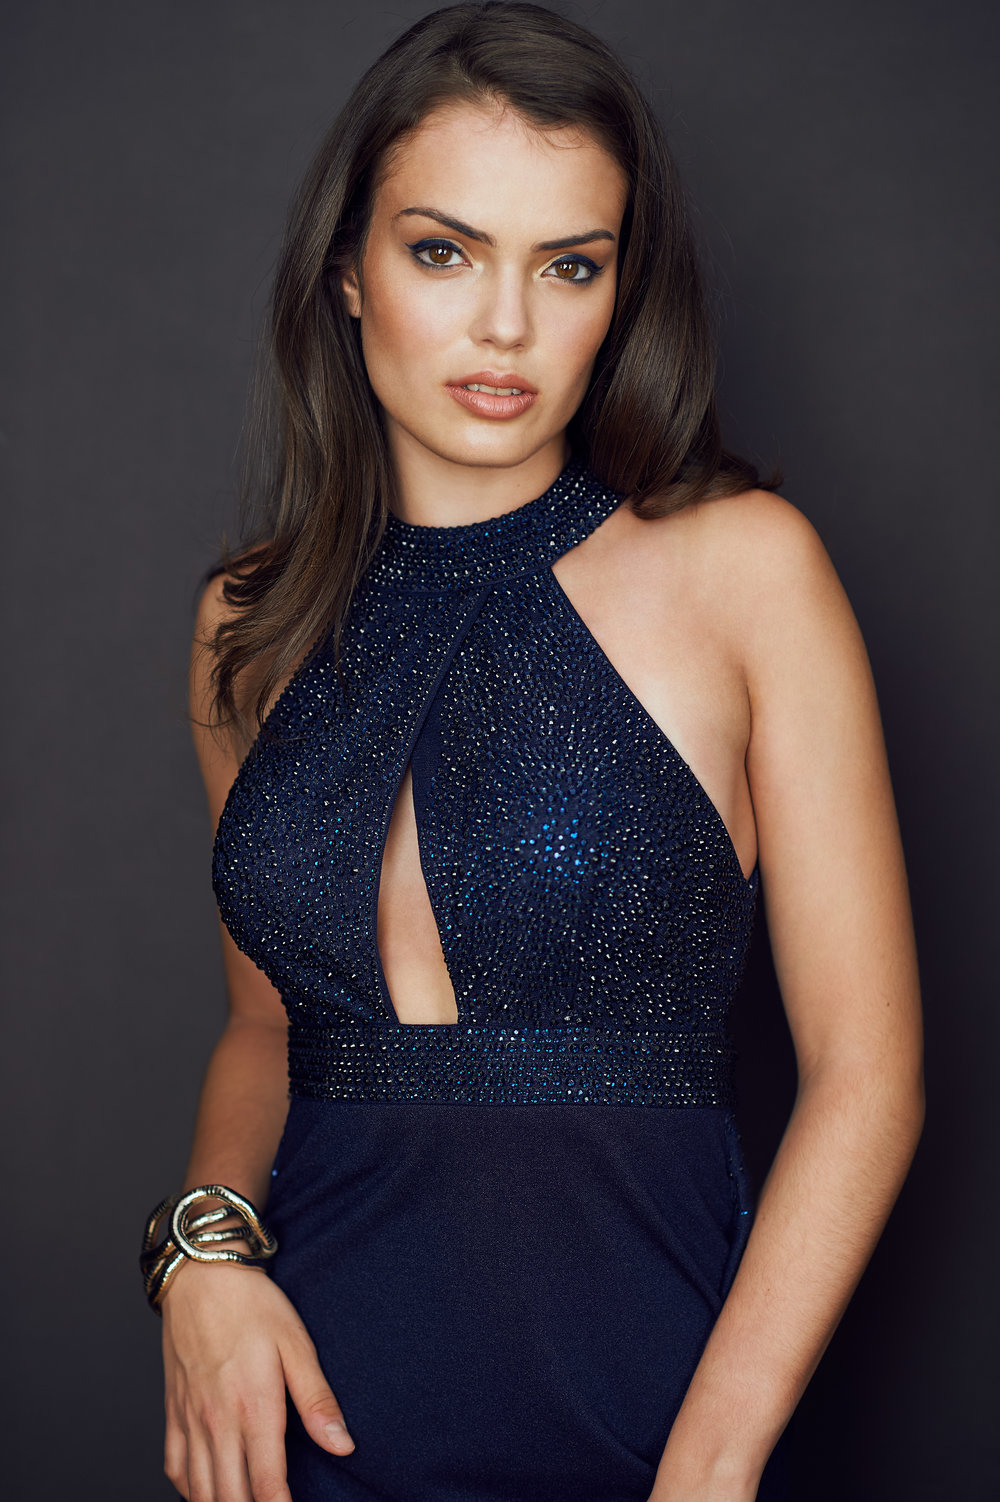 Marta-Hewson-Ivana-Glavic-Model-Portfolio-54188.jpg